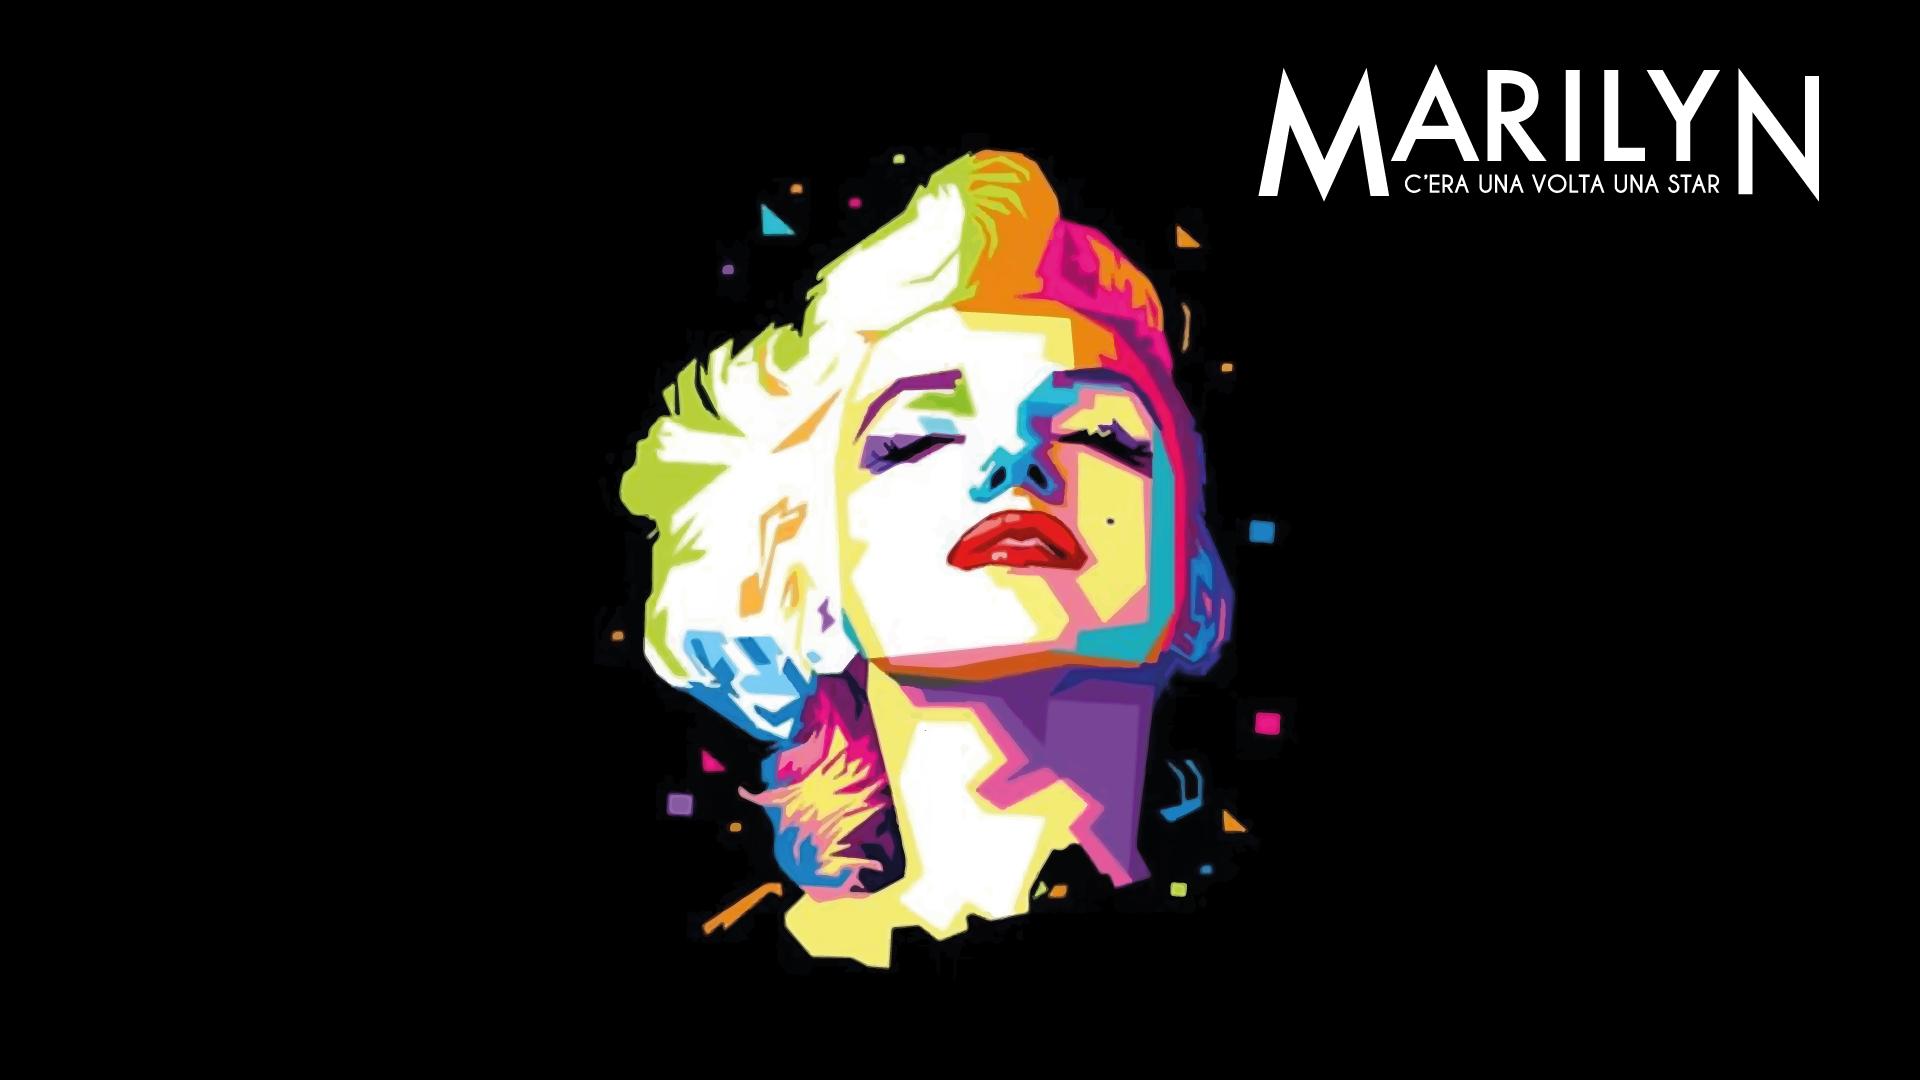 Marilyn. C'era una volta una star